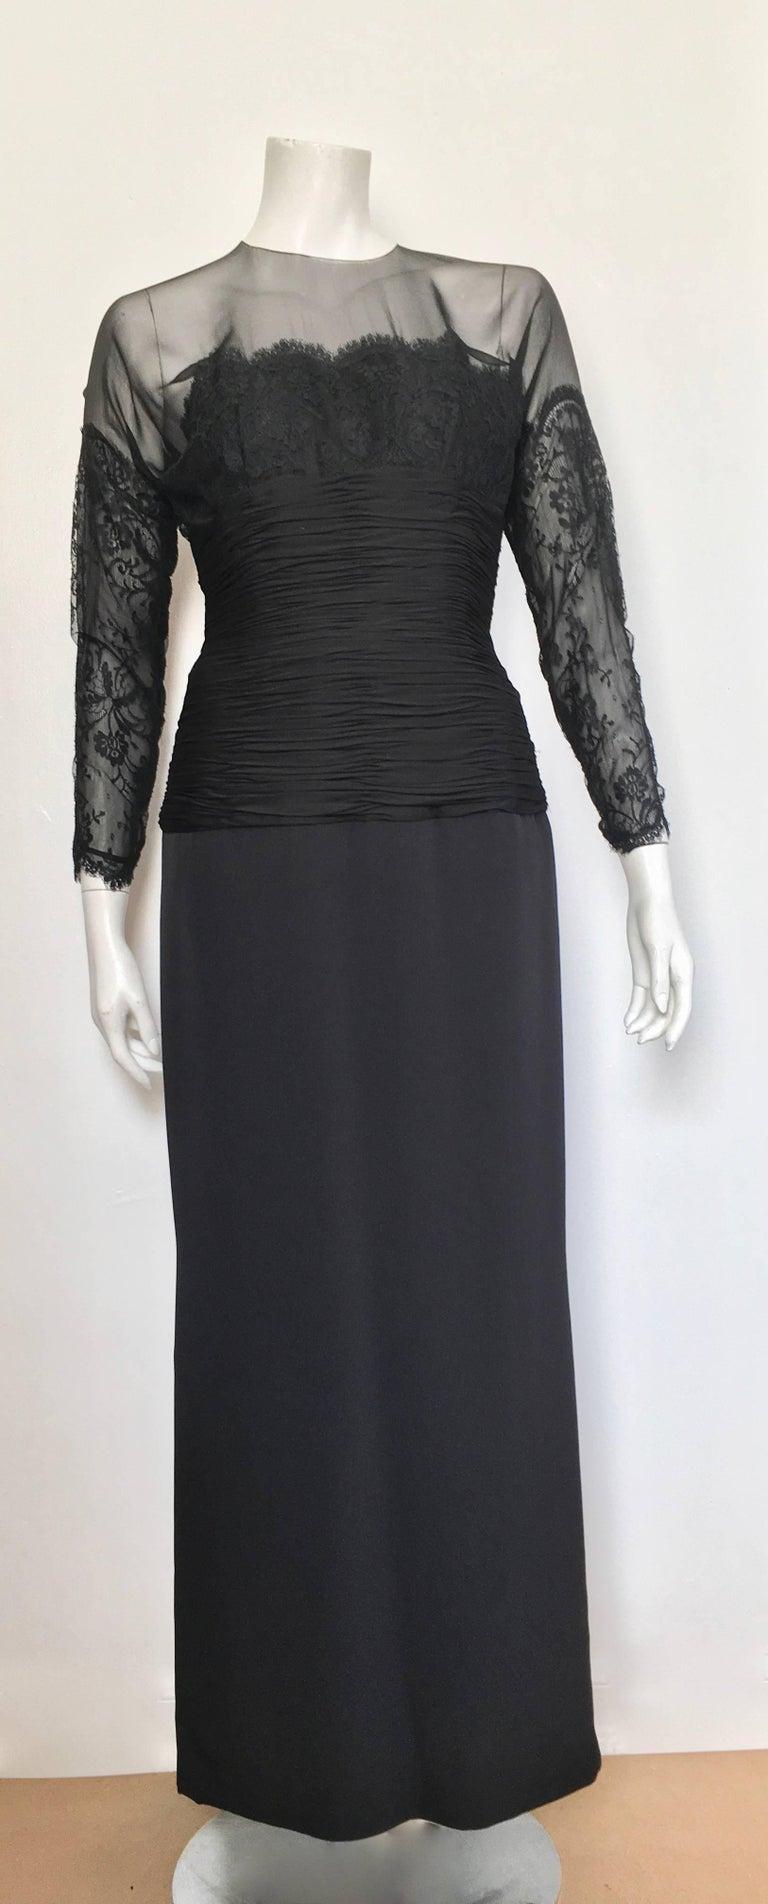 Oscar de la Renta Black Lace Evening Gown Size 6. For Sale at 1stdibs